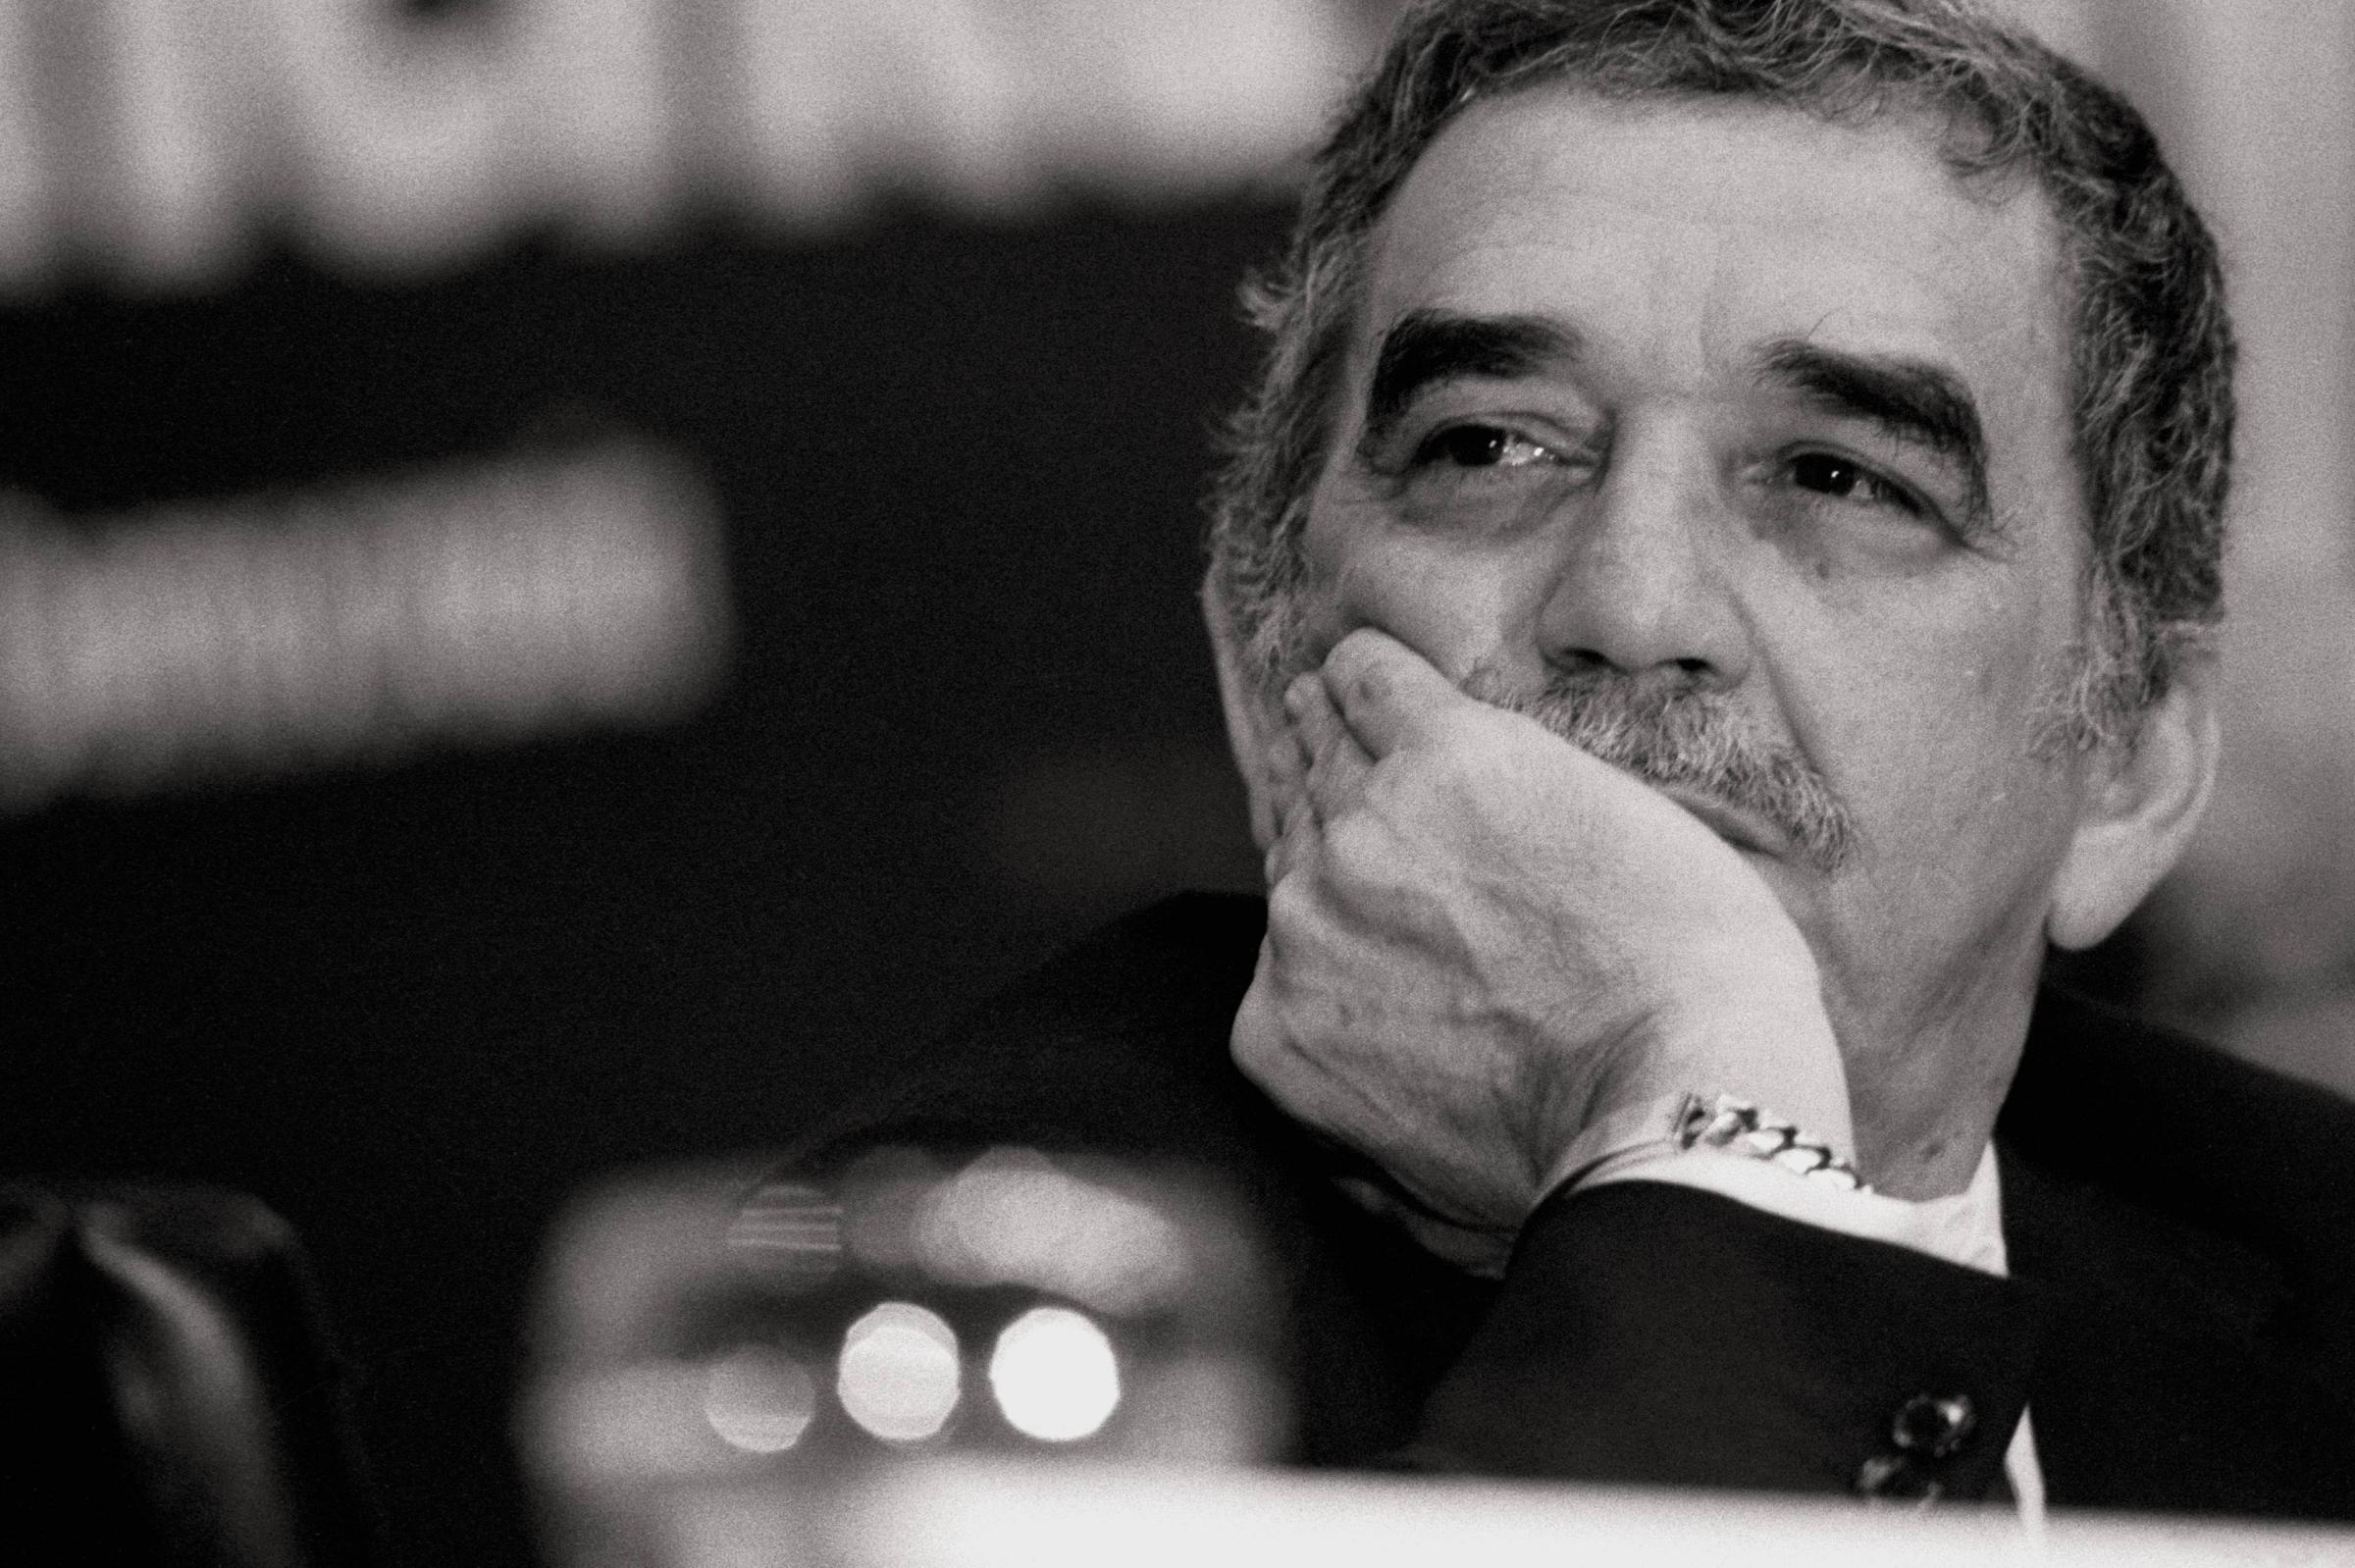 gabriel garcia Gabriel garcía márquez, (born march 6, 1927, aracataca, colombia—died april  17, 2014, mexico city, mexico), colombian novelist and one of the greatest.